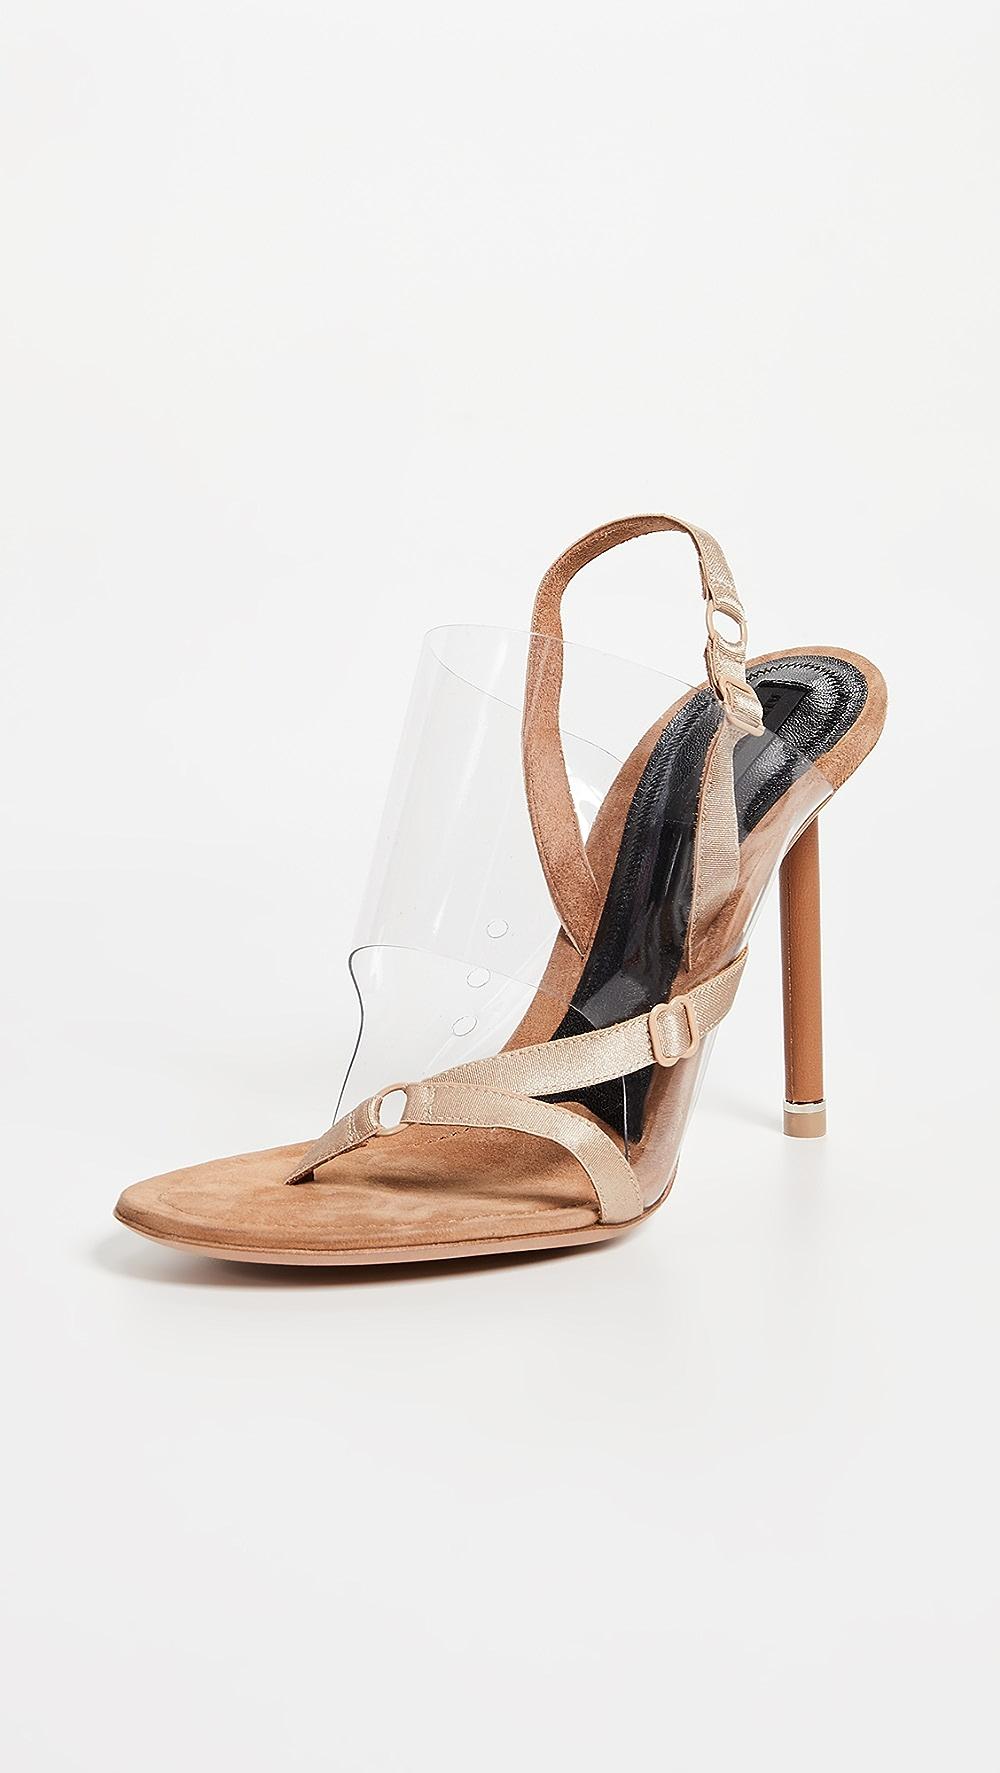 2019 Latest Design Alexander Wang - Kaia High Heel Sandals Removing Obstruction